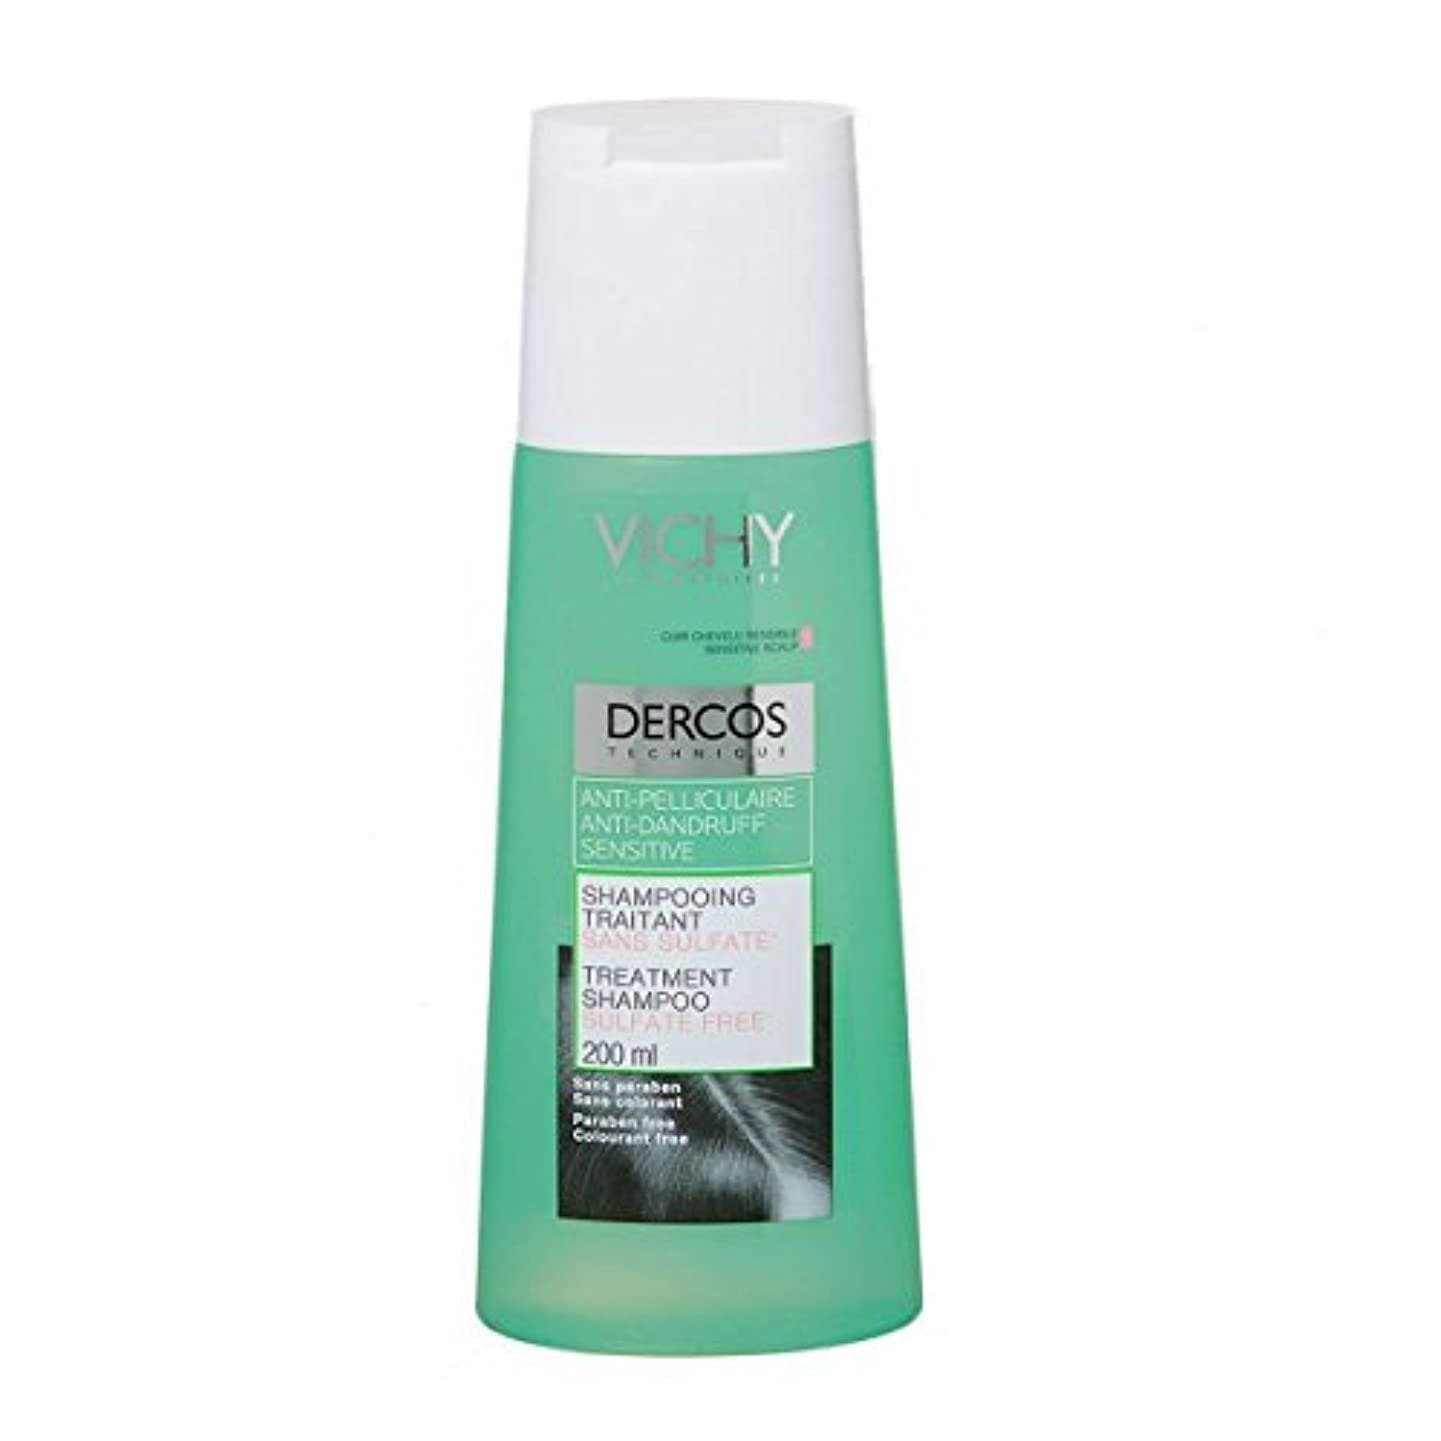 Dercos Anti-dandruff Sensitive Scalp 200ml [並行輸入品]